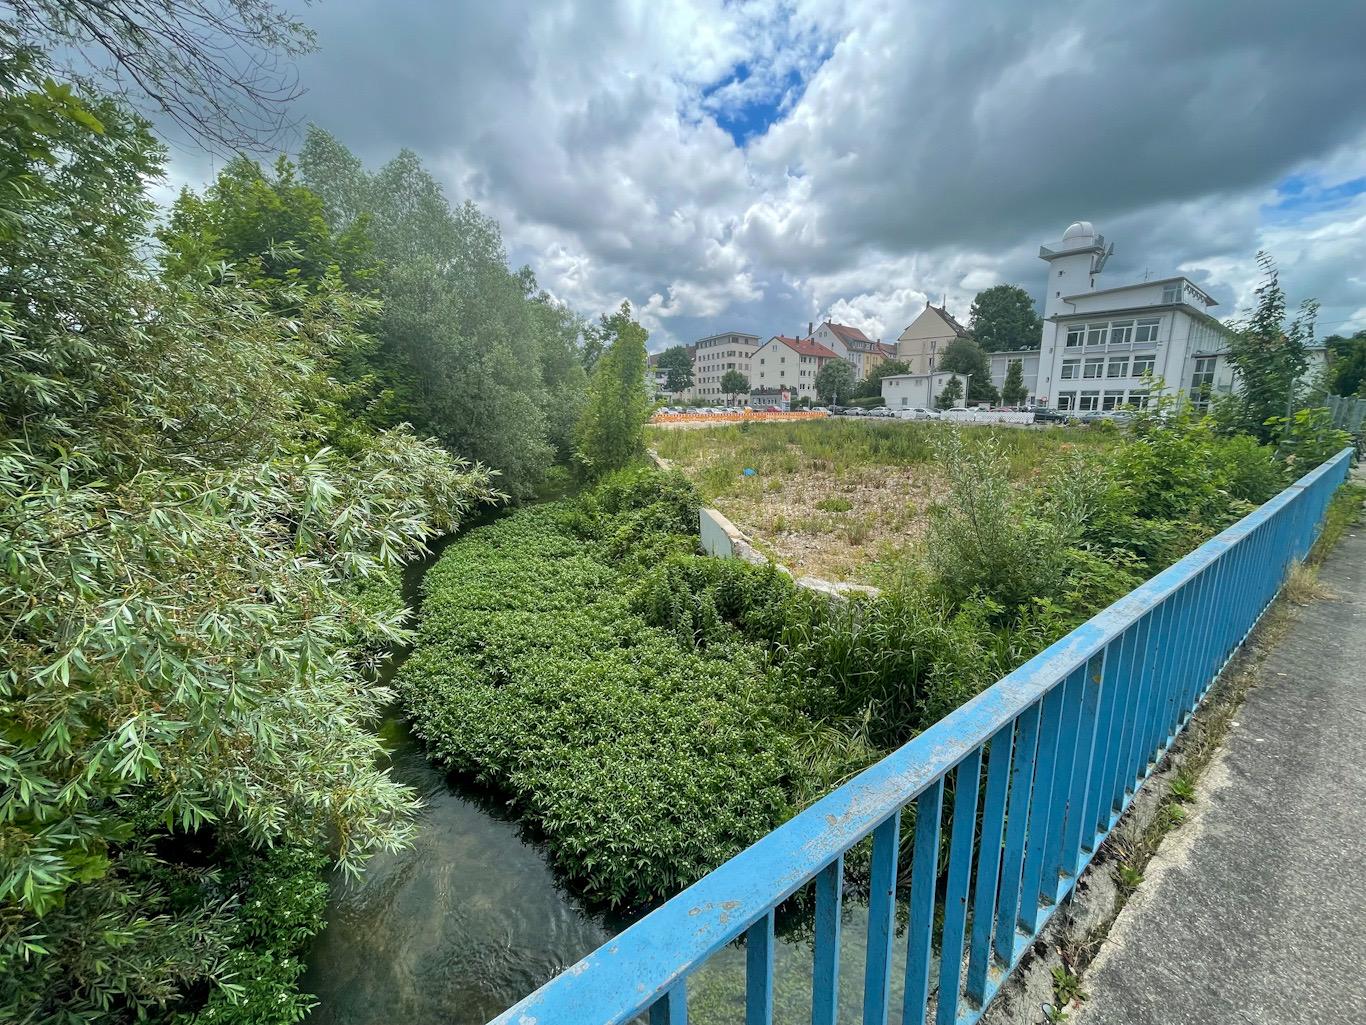 Ulm, Neubau, Kleije Blau, Juni 2021